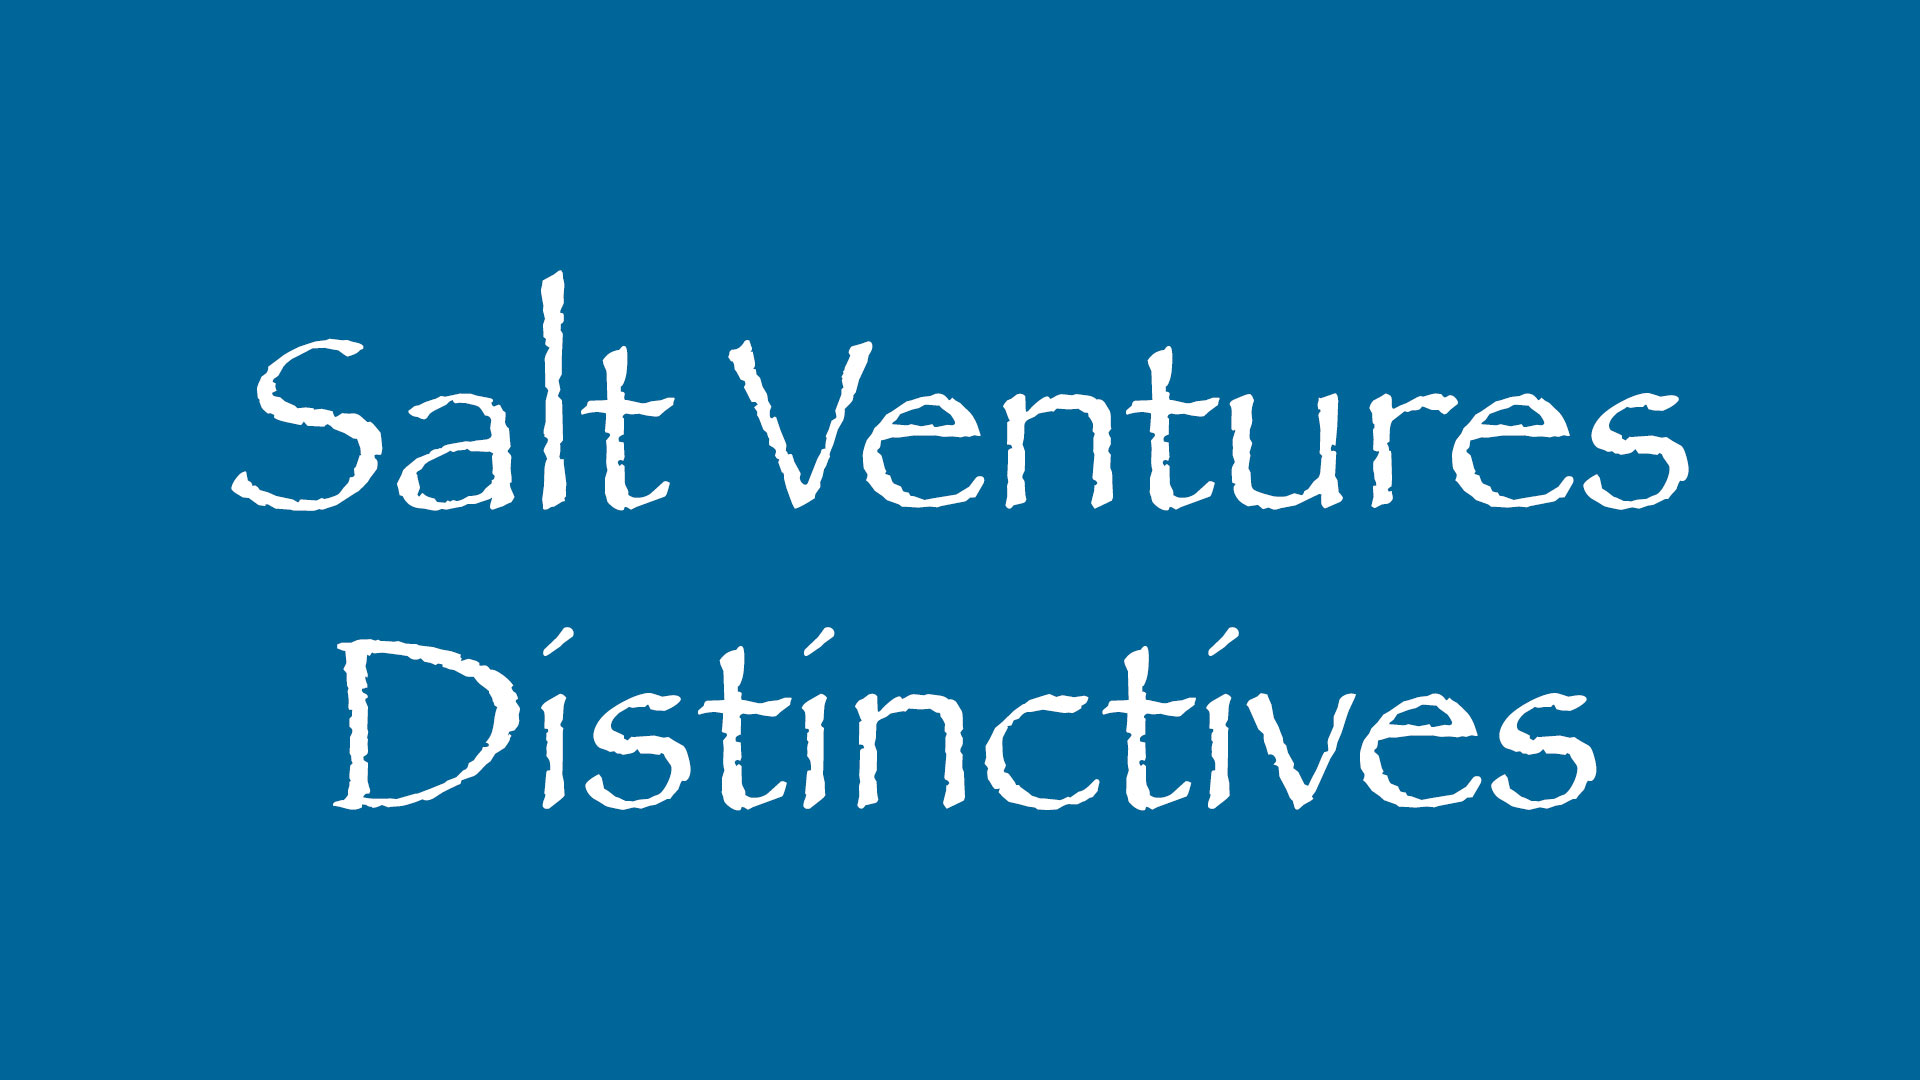 salt ventures distinctives banner